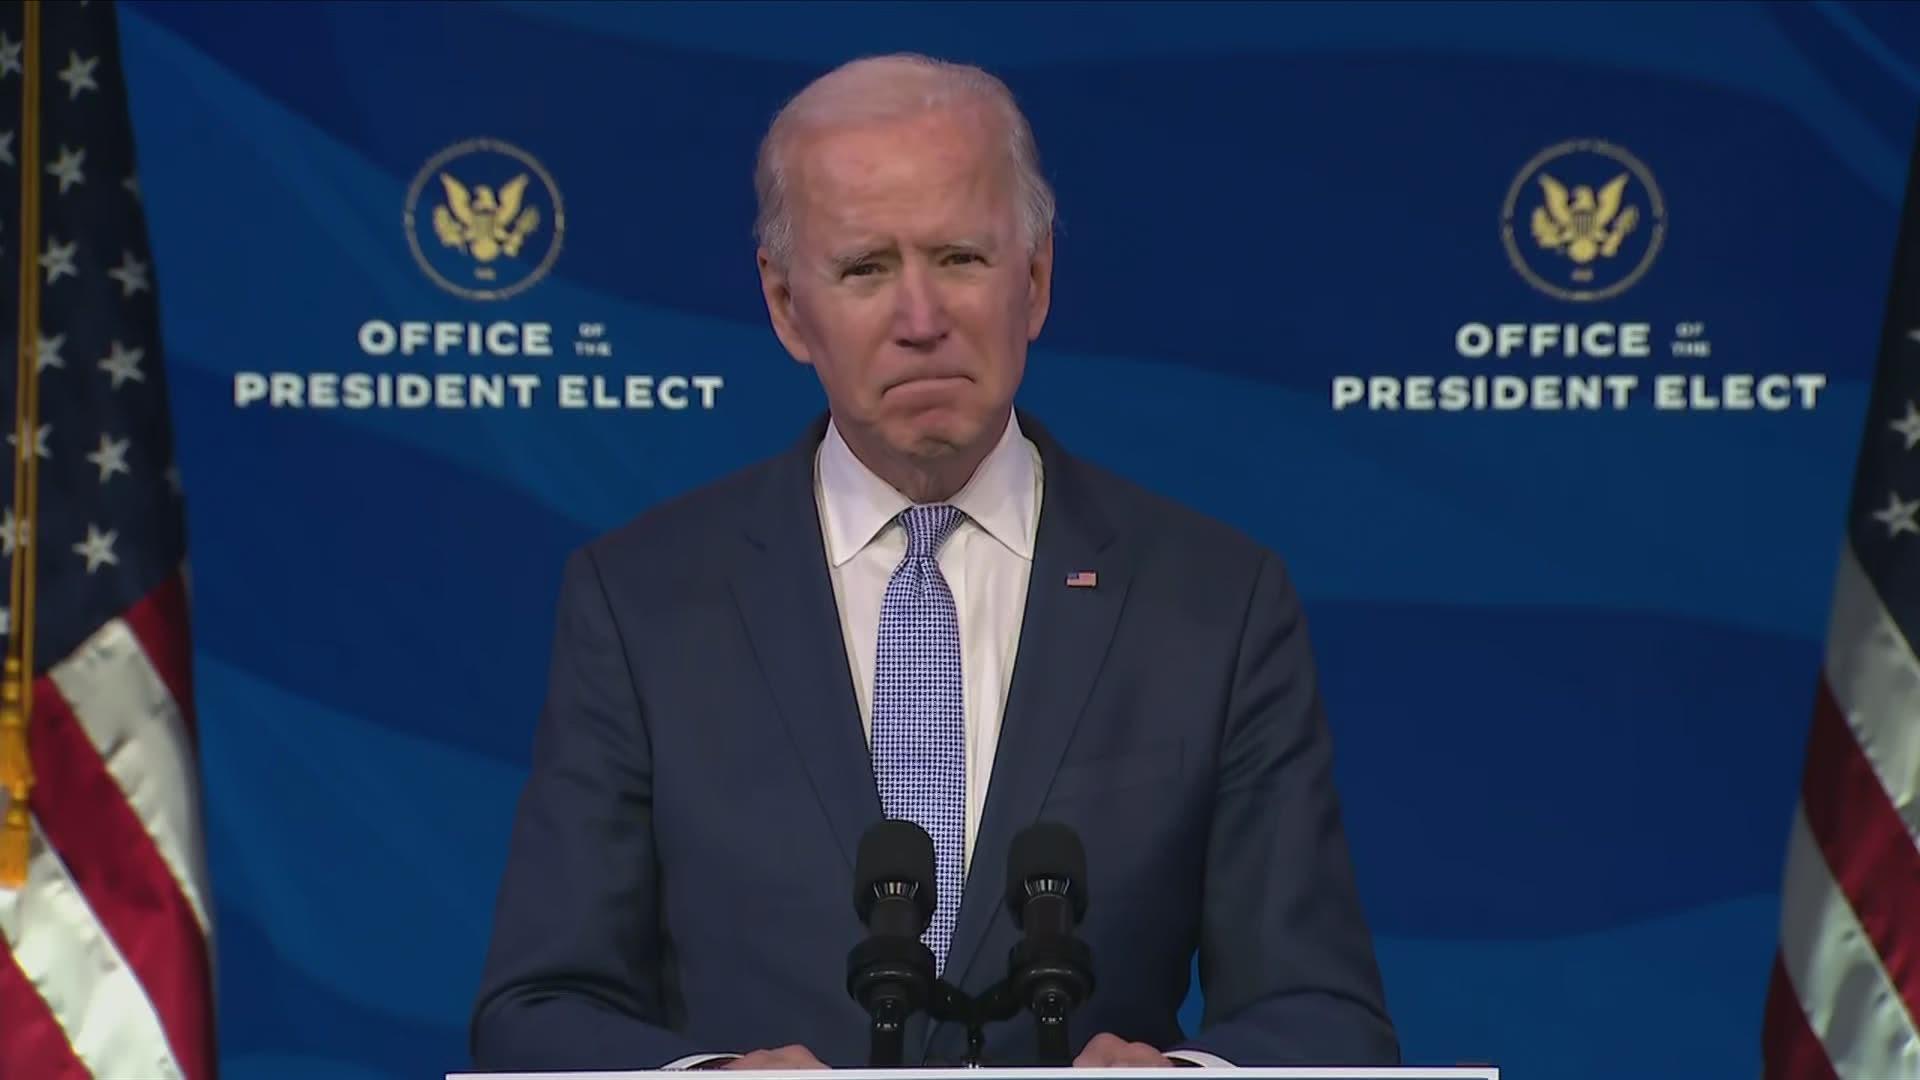 Biden demands Trump supporters to 'pull back,' urges decency | khou.com